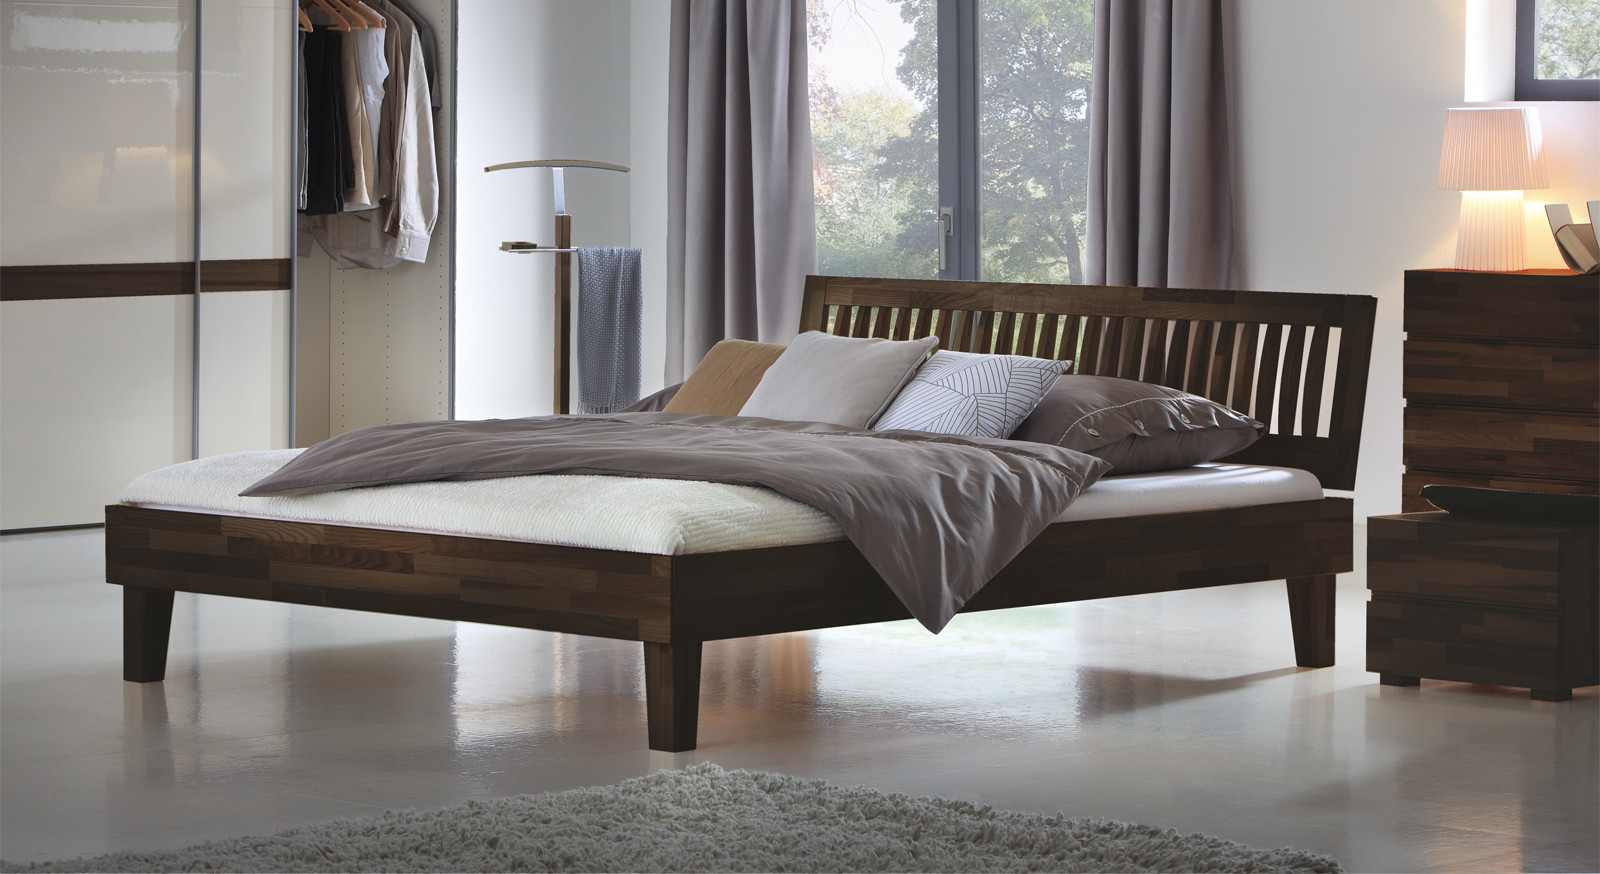 Massivholzbett 200x200  Weißes Massivholzbett in z B 200x200 cm Größe Bett Laredo